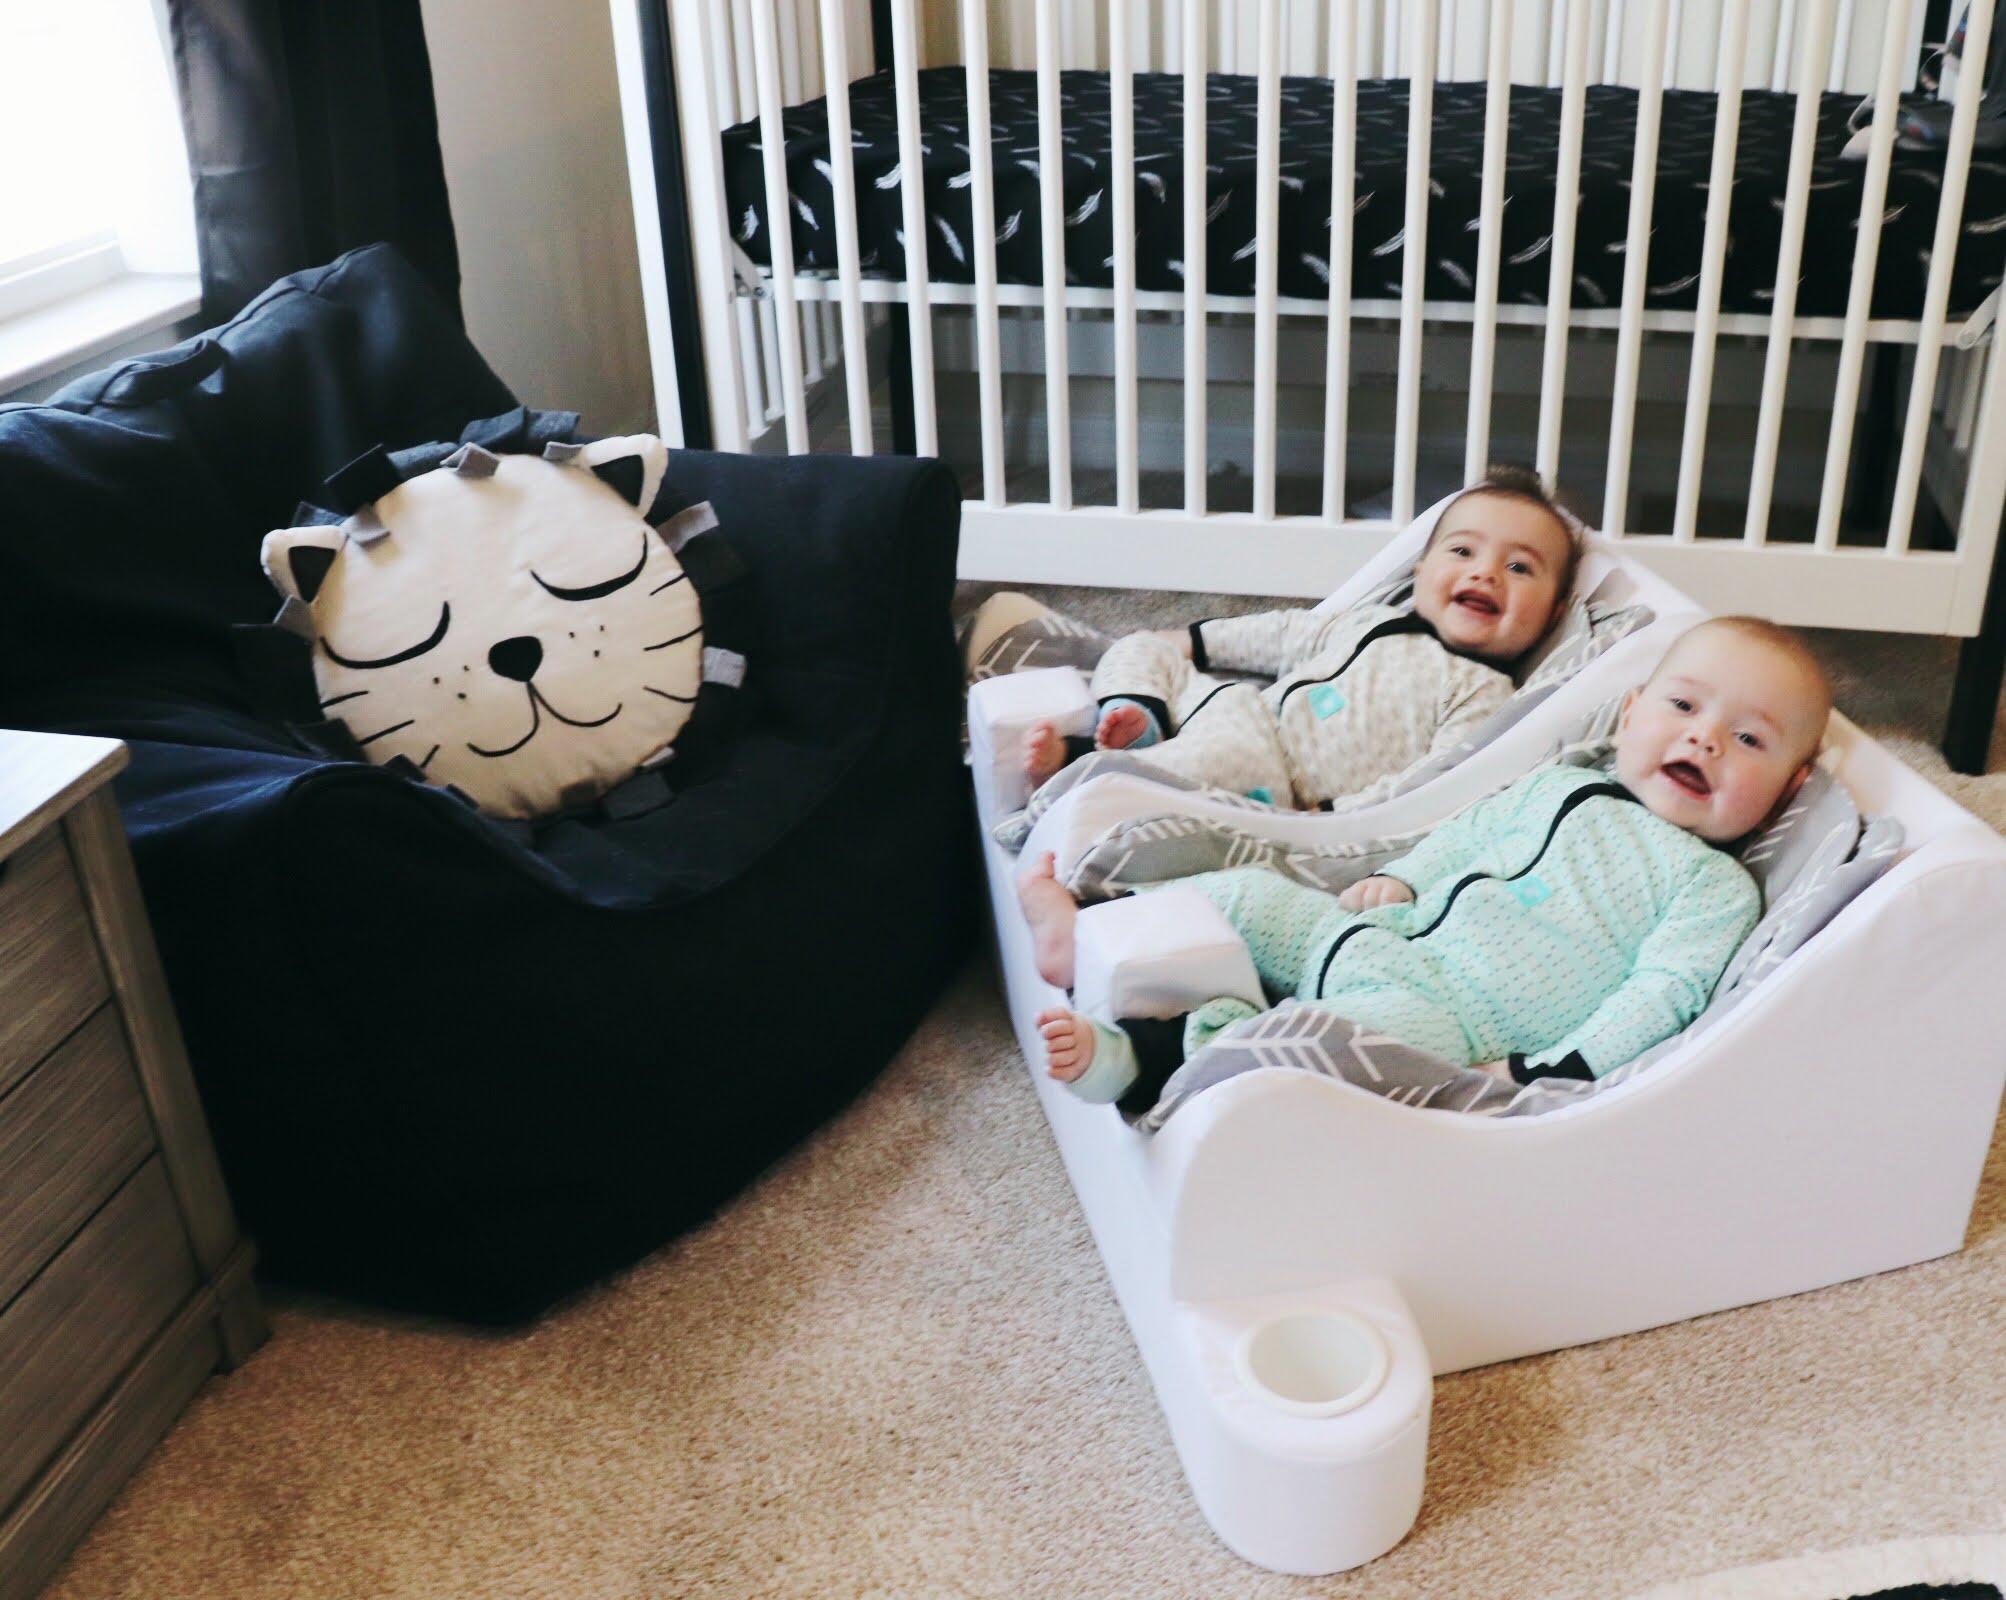 bedtime routine twins, twin bedtime routine, twins routine, twins sleeping through the night, twin bedtime routine, routine for twins, twins sttn